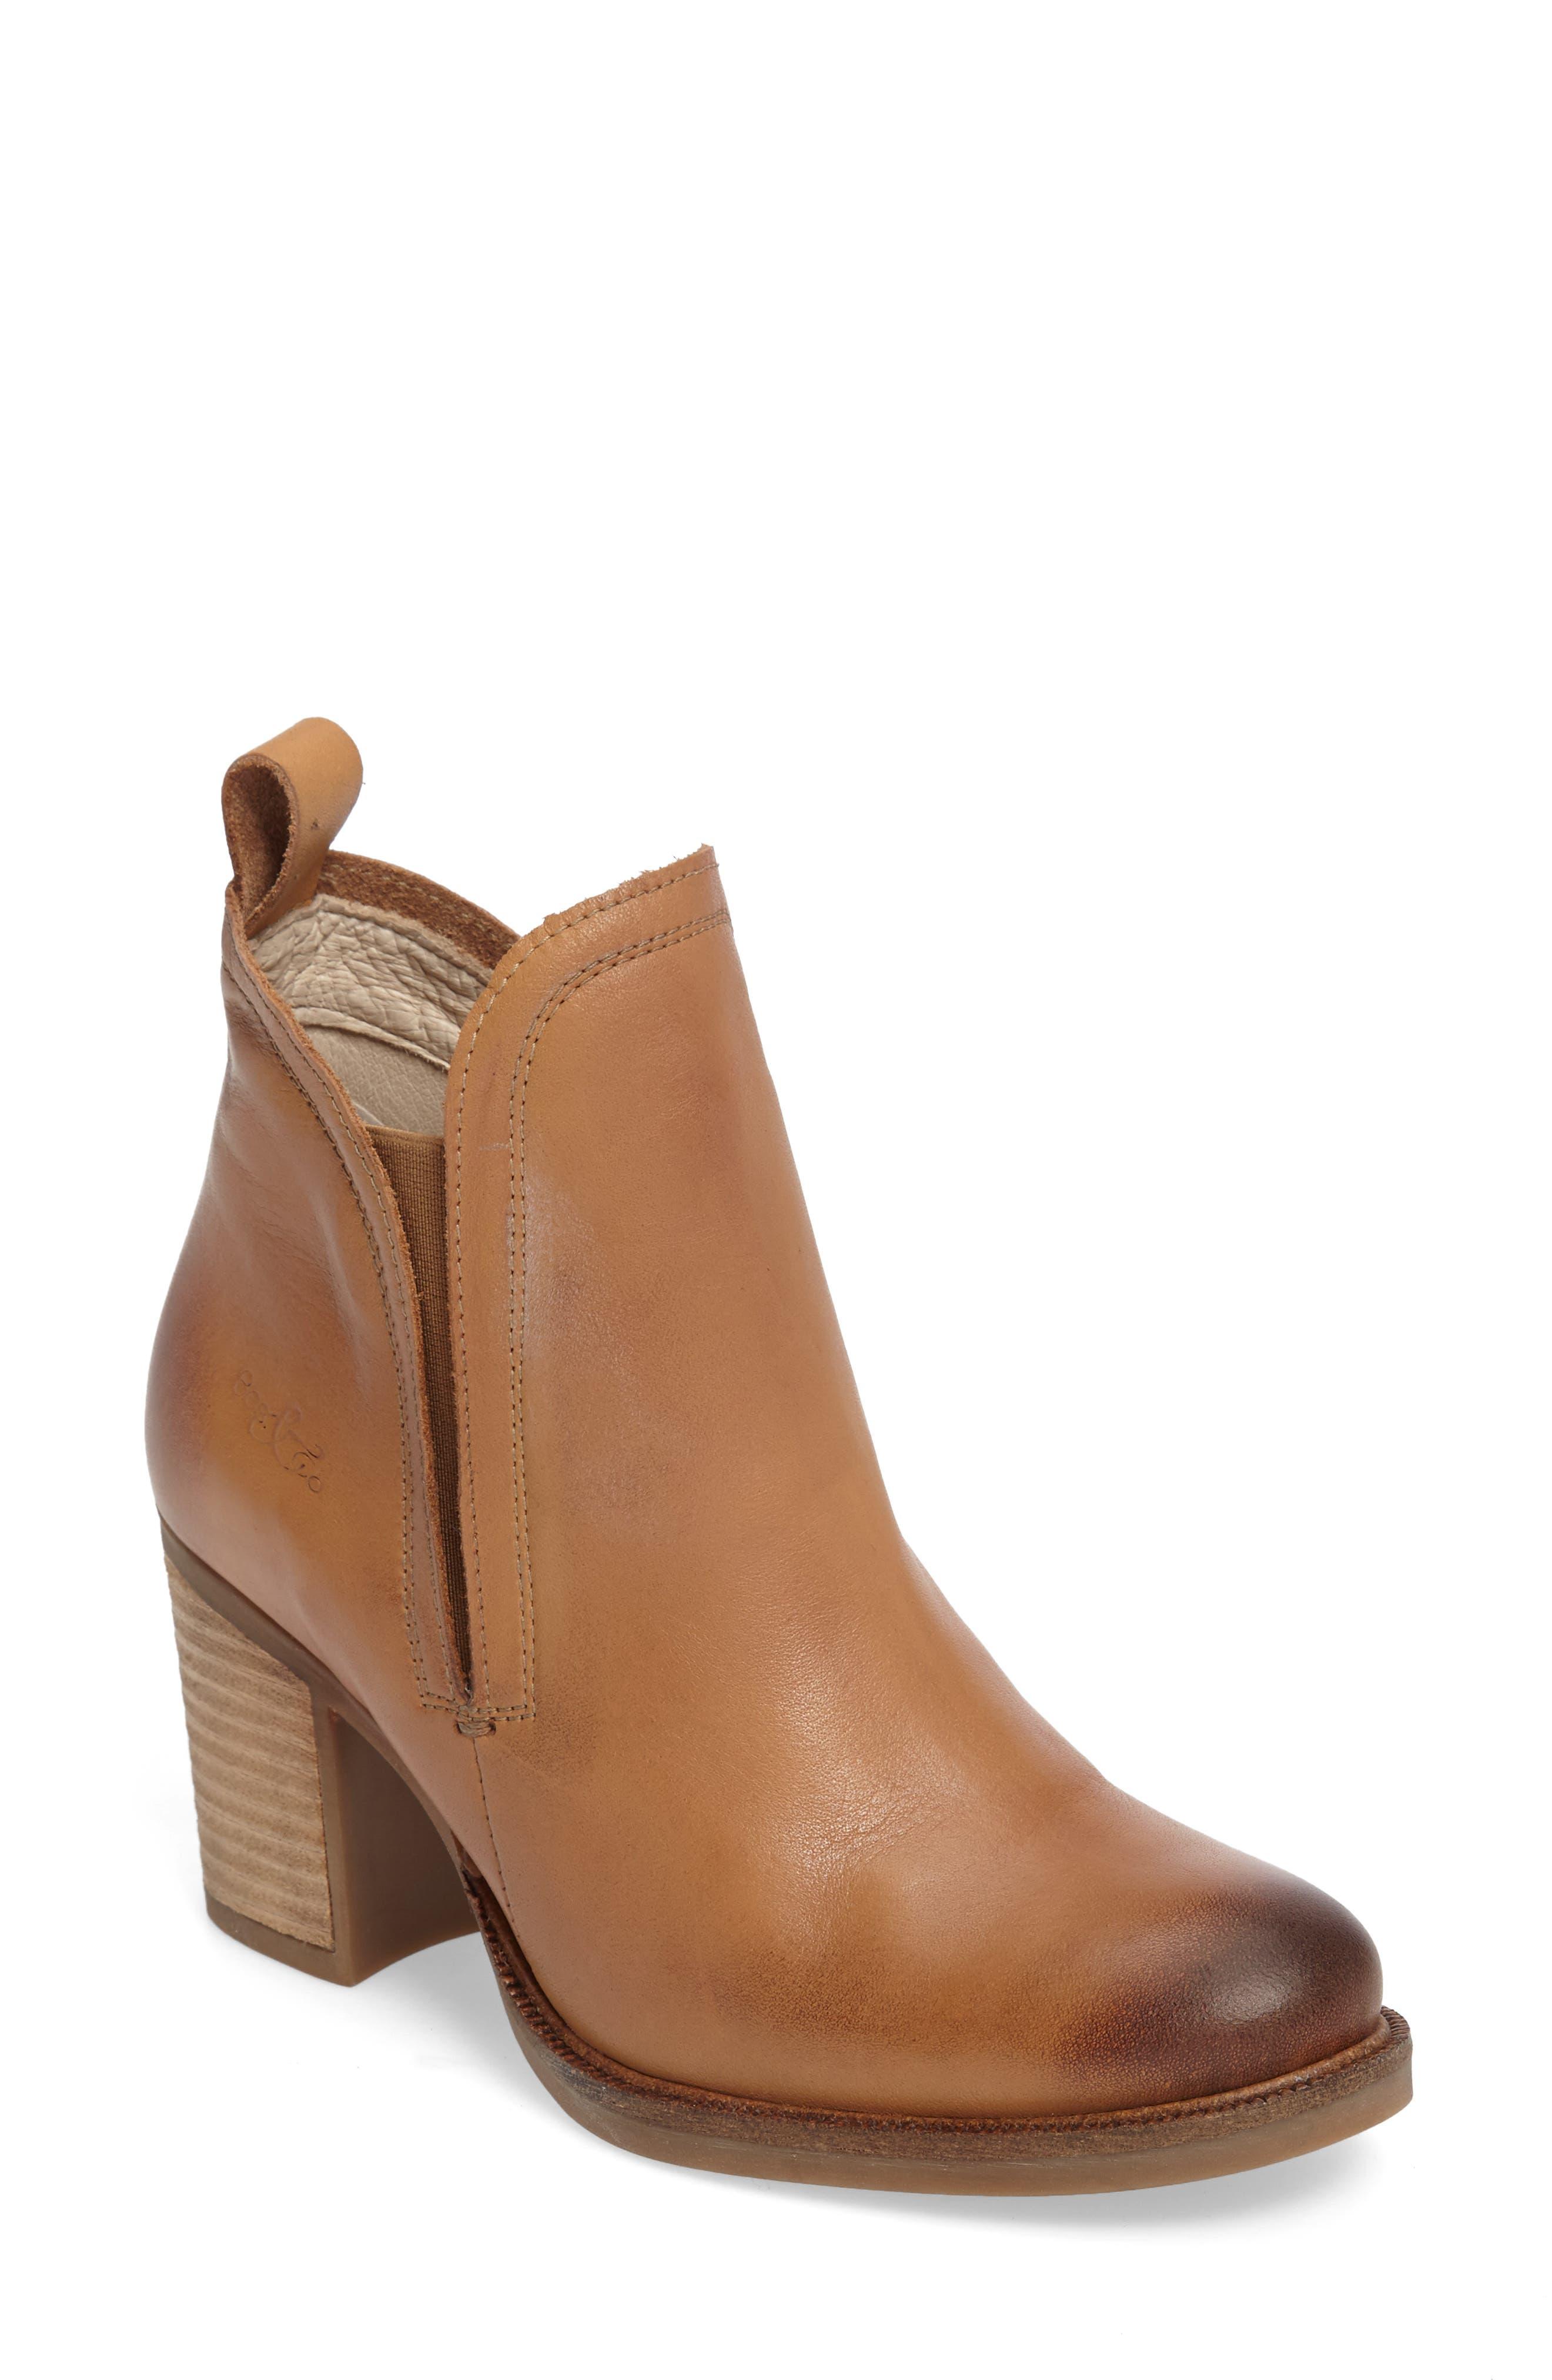 Alternate Image 1 Selected - Bos. & Co. Belfielding Waterproof Chelsea Boot (Women)